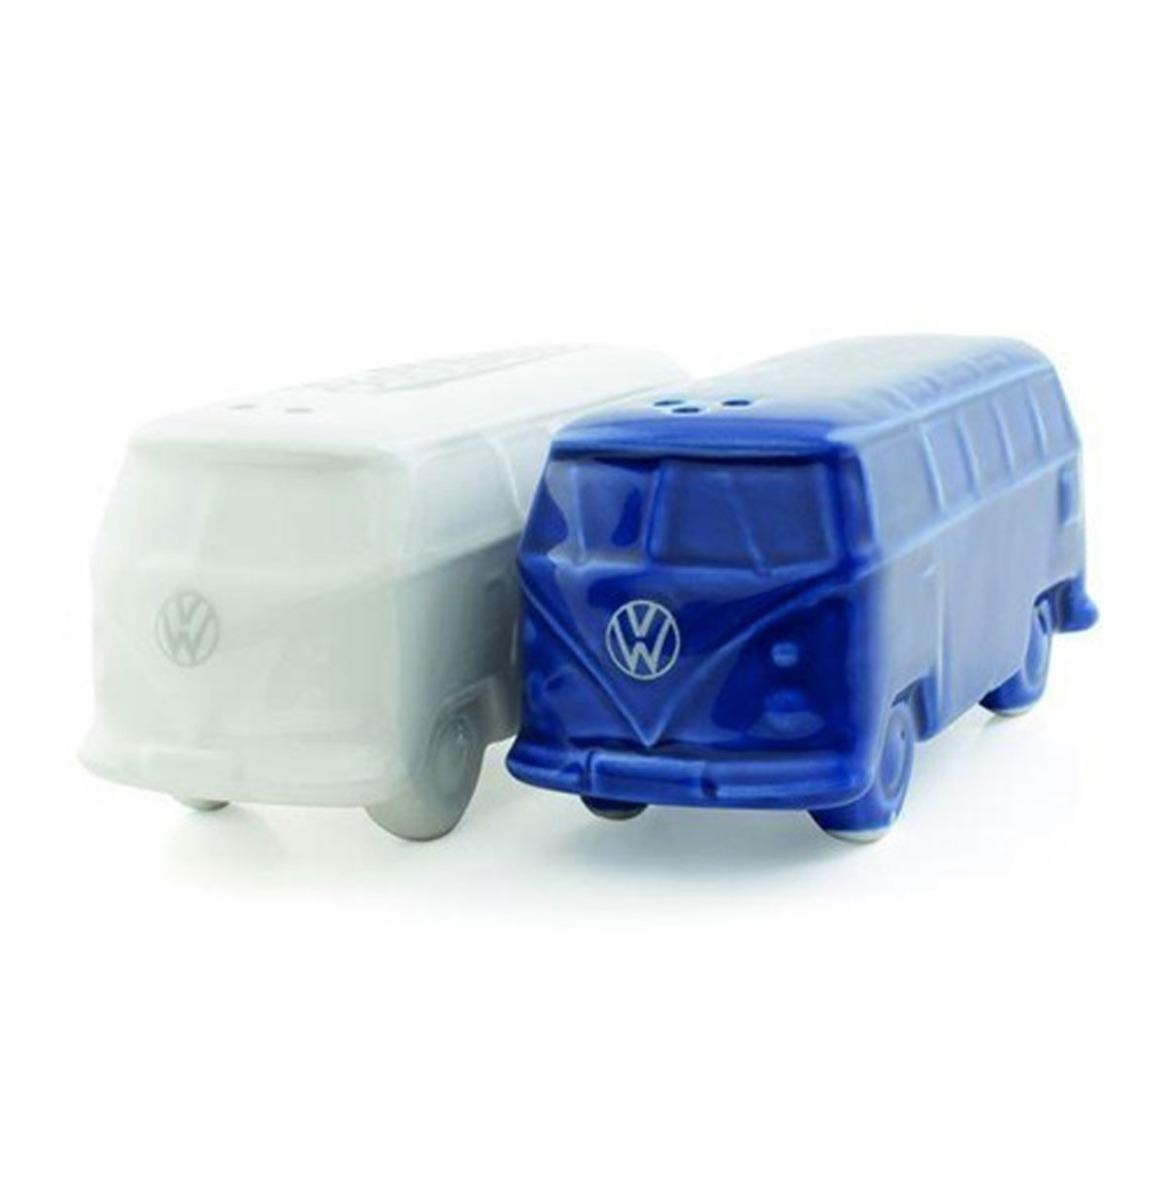 Volkswagen Zout&Peper Stelletje - Blauw/Wit